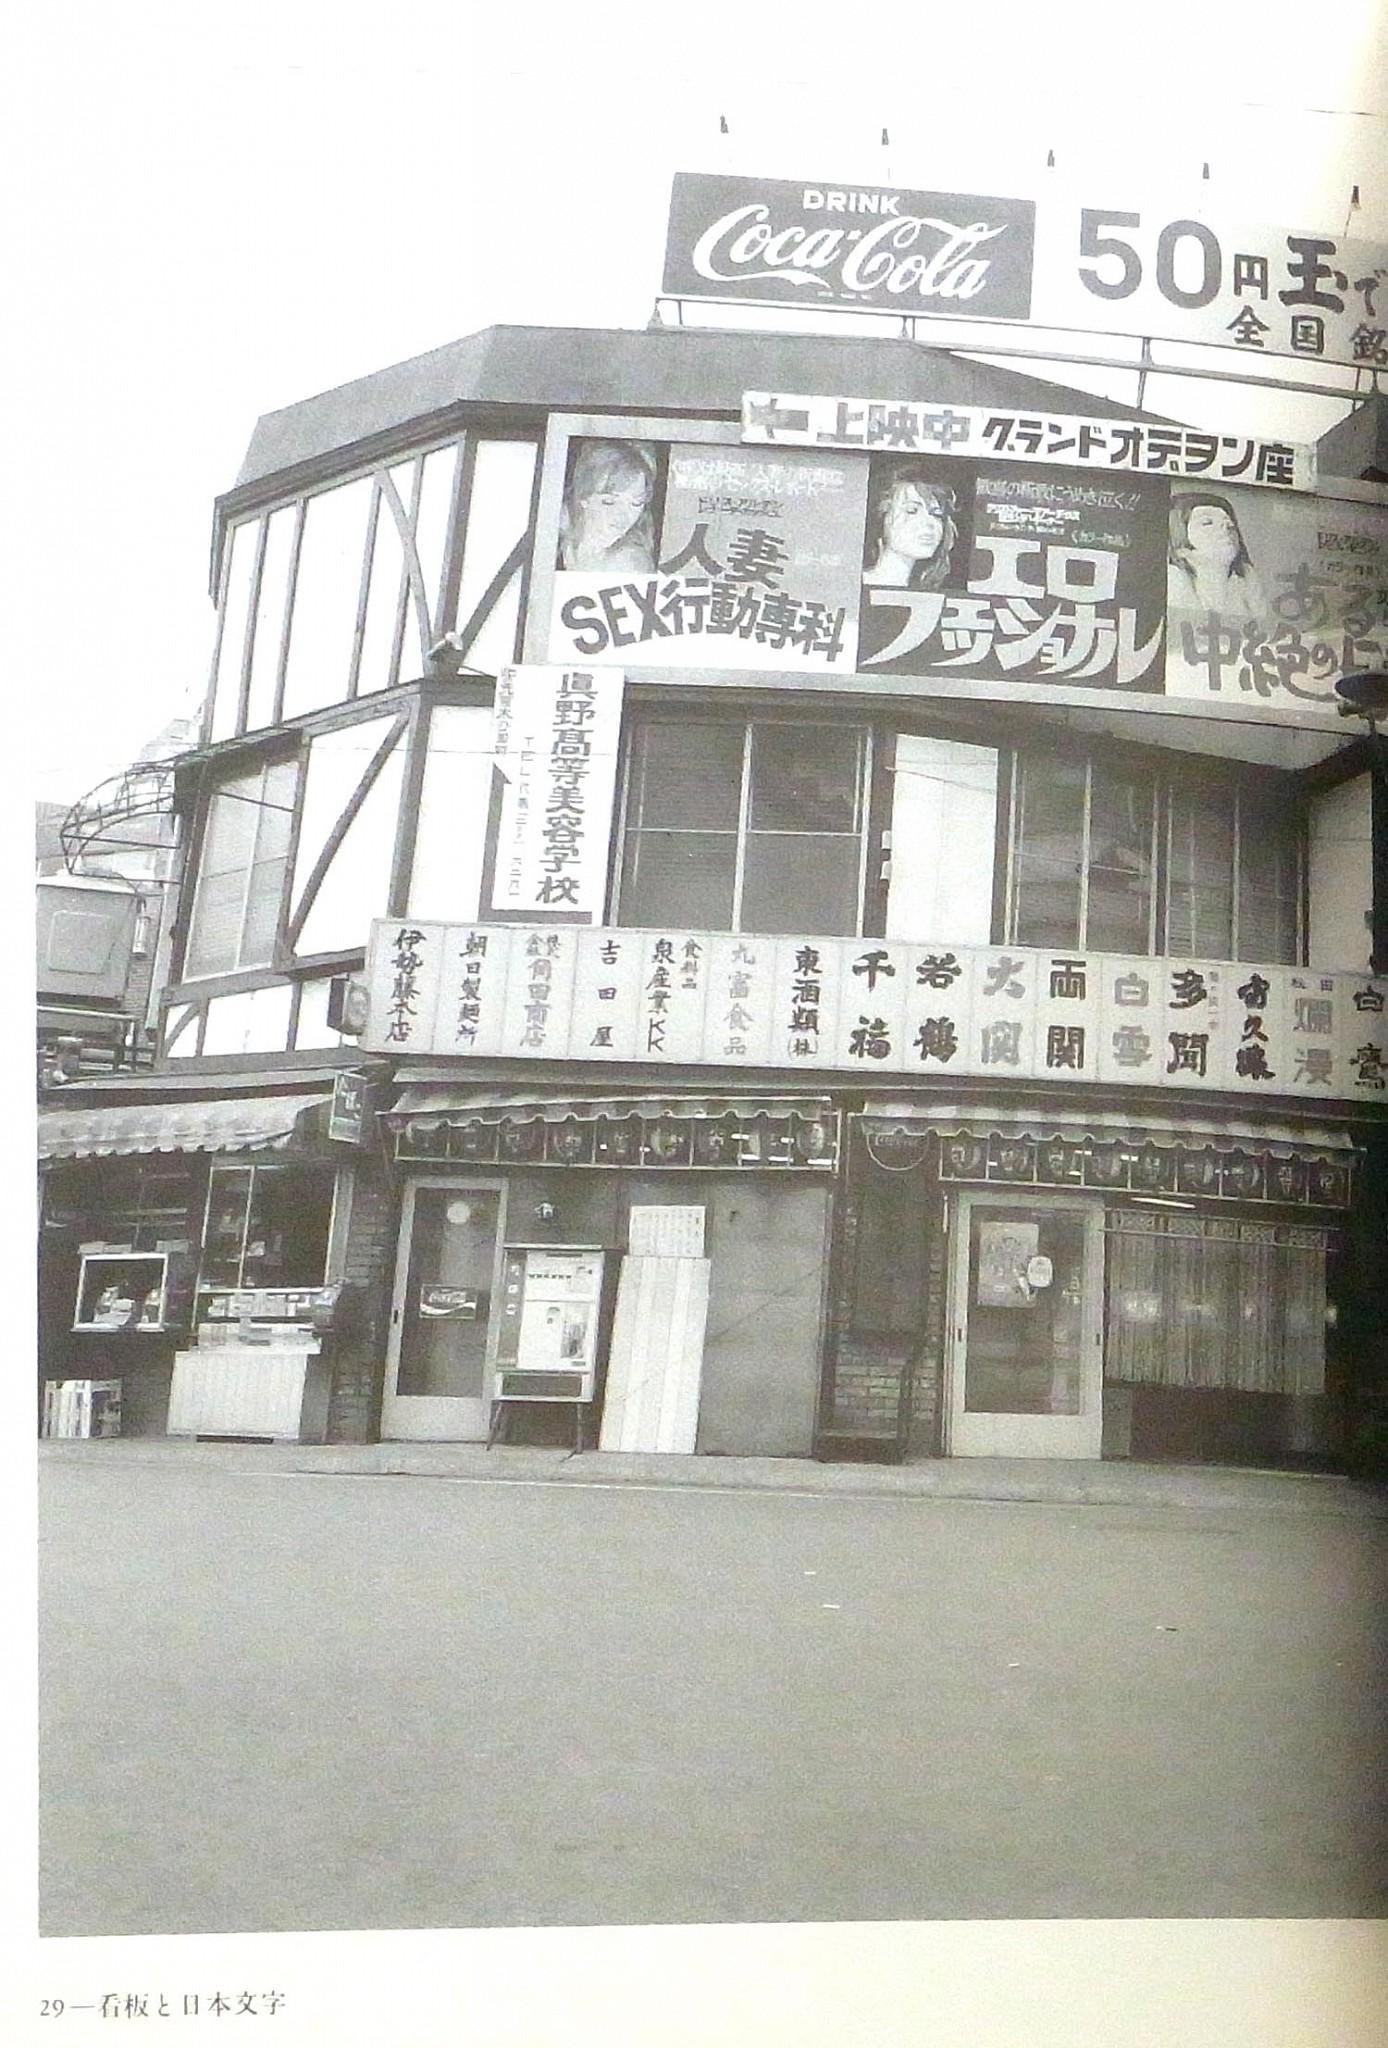 Seiji Kurata Flash Up Street Photorandom Tokyo 1975 1979 1980 Home Gt Switches Progressive Toggle Switch Noboyoshi Araki Autumn 1984